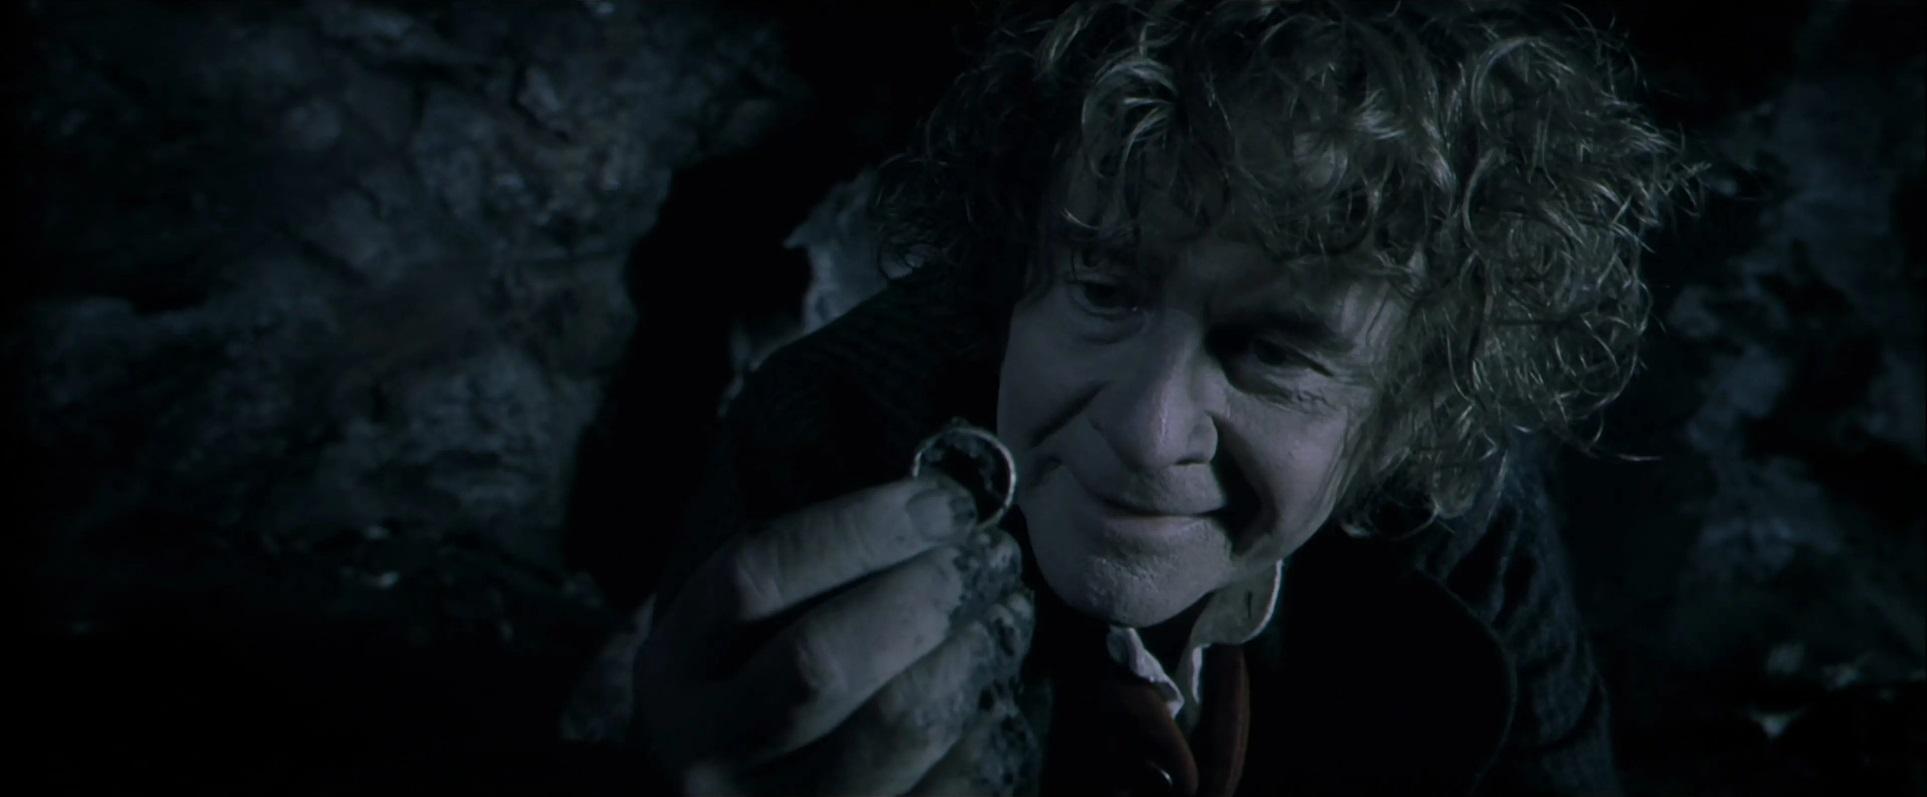 File:Bilbo-finds-ring.JPG